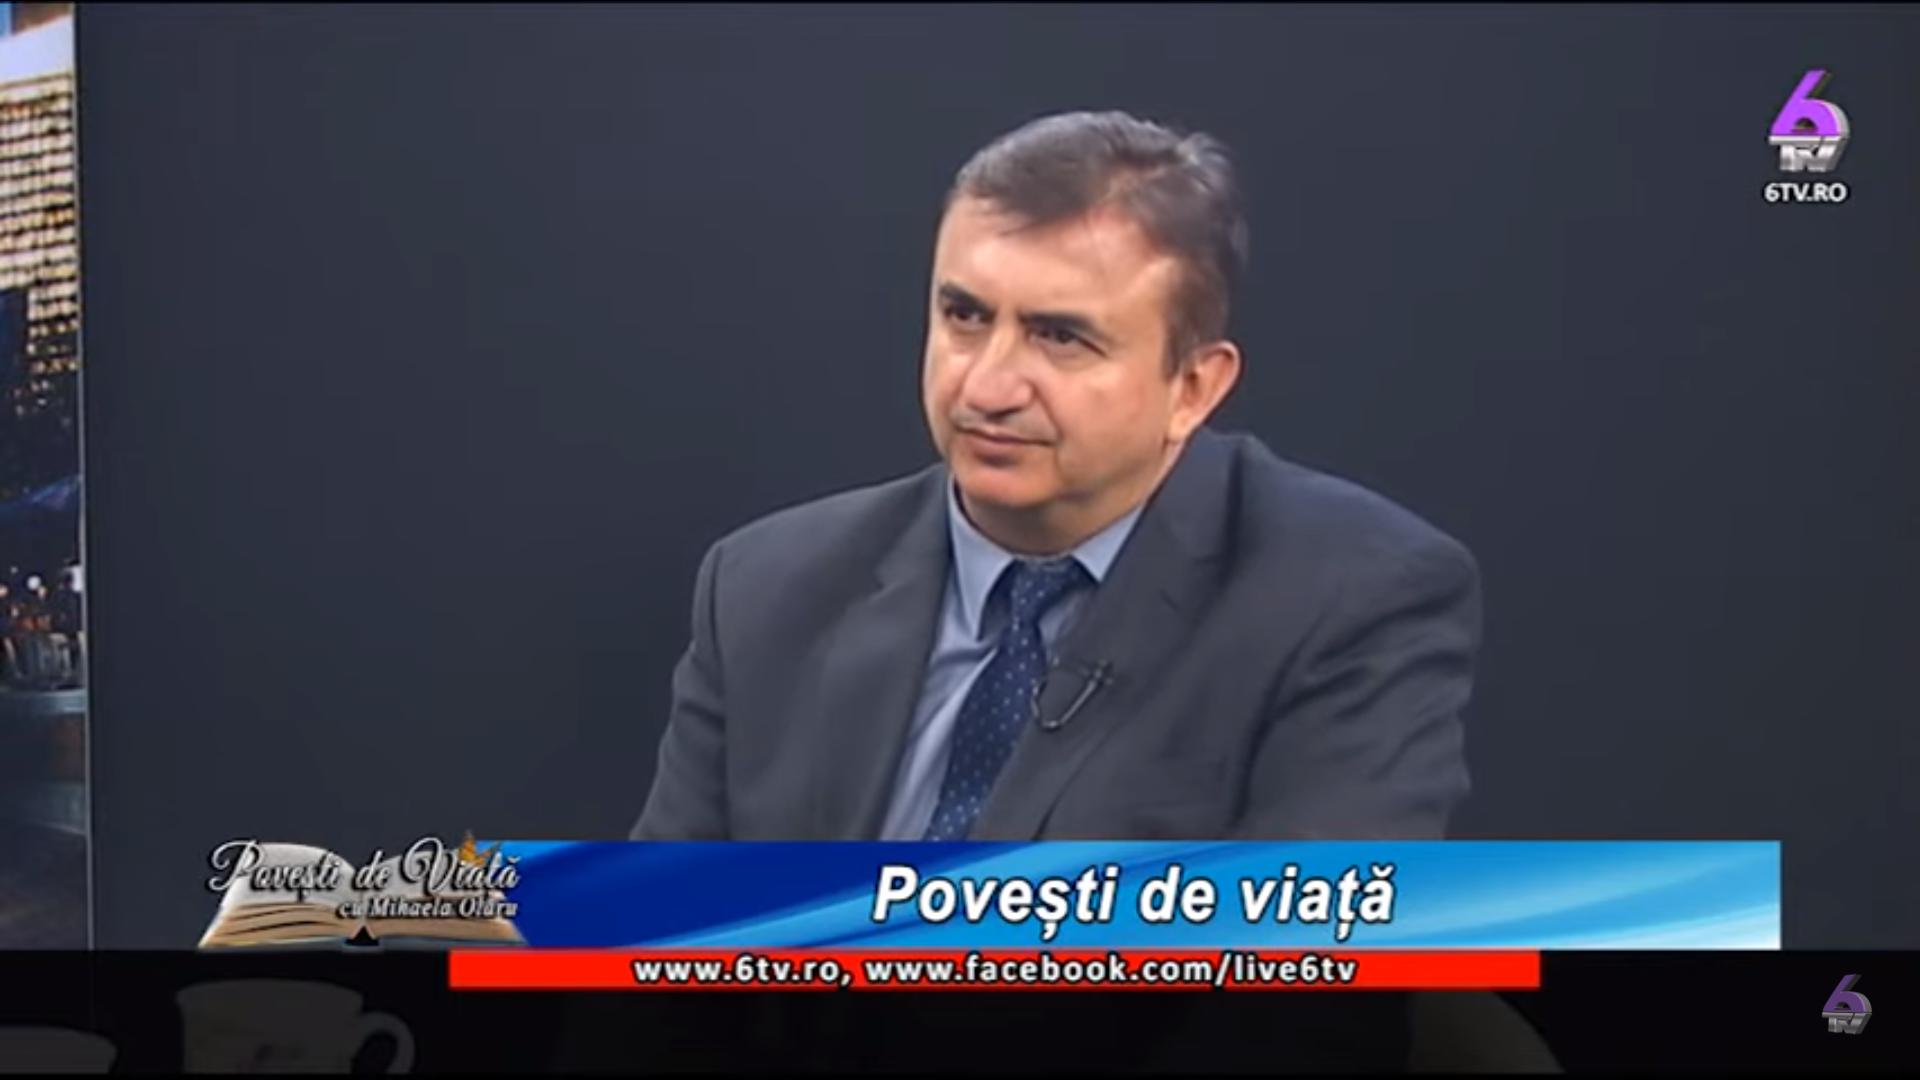 14. Doctor Irinel Nedelcu